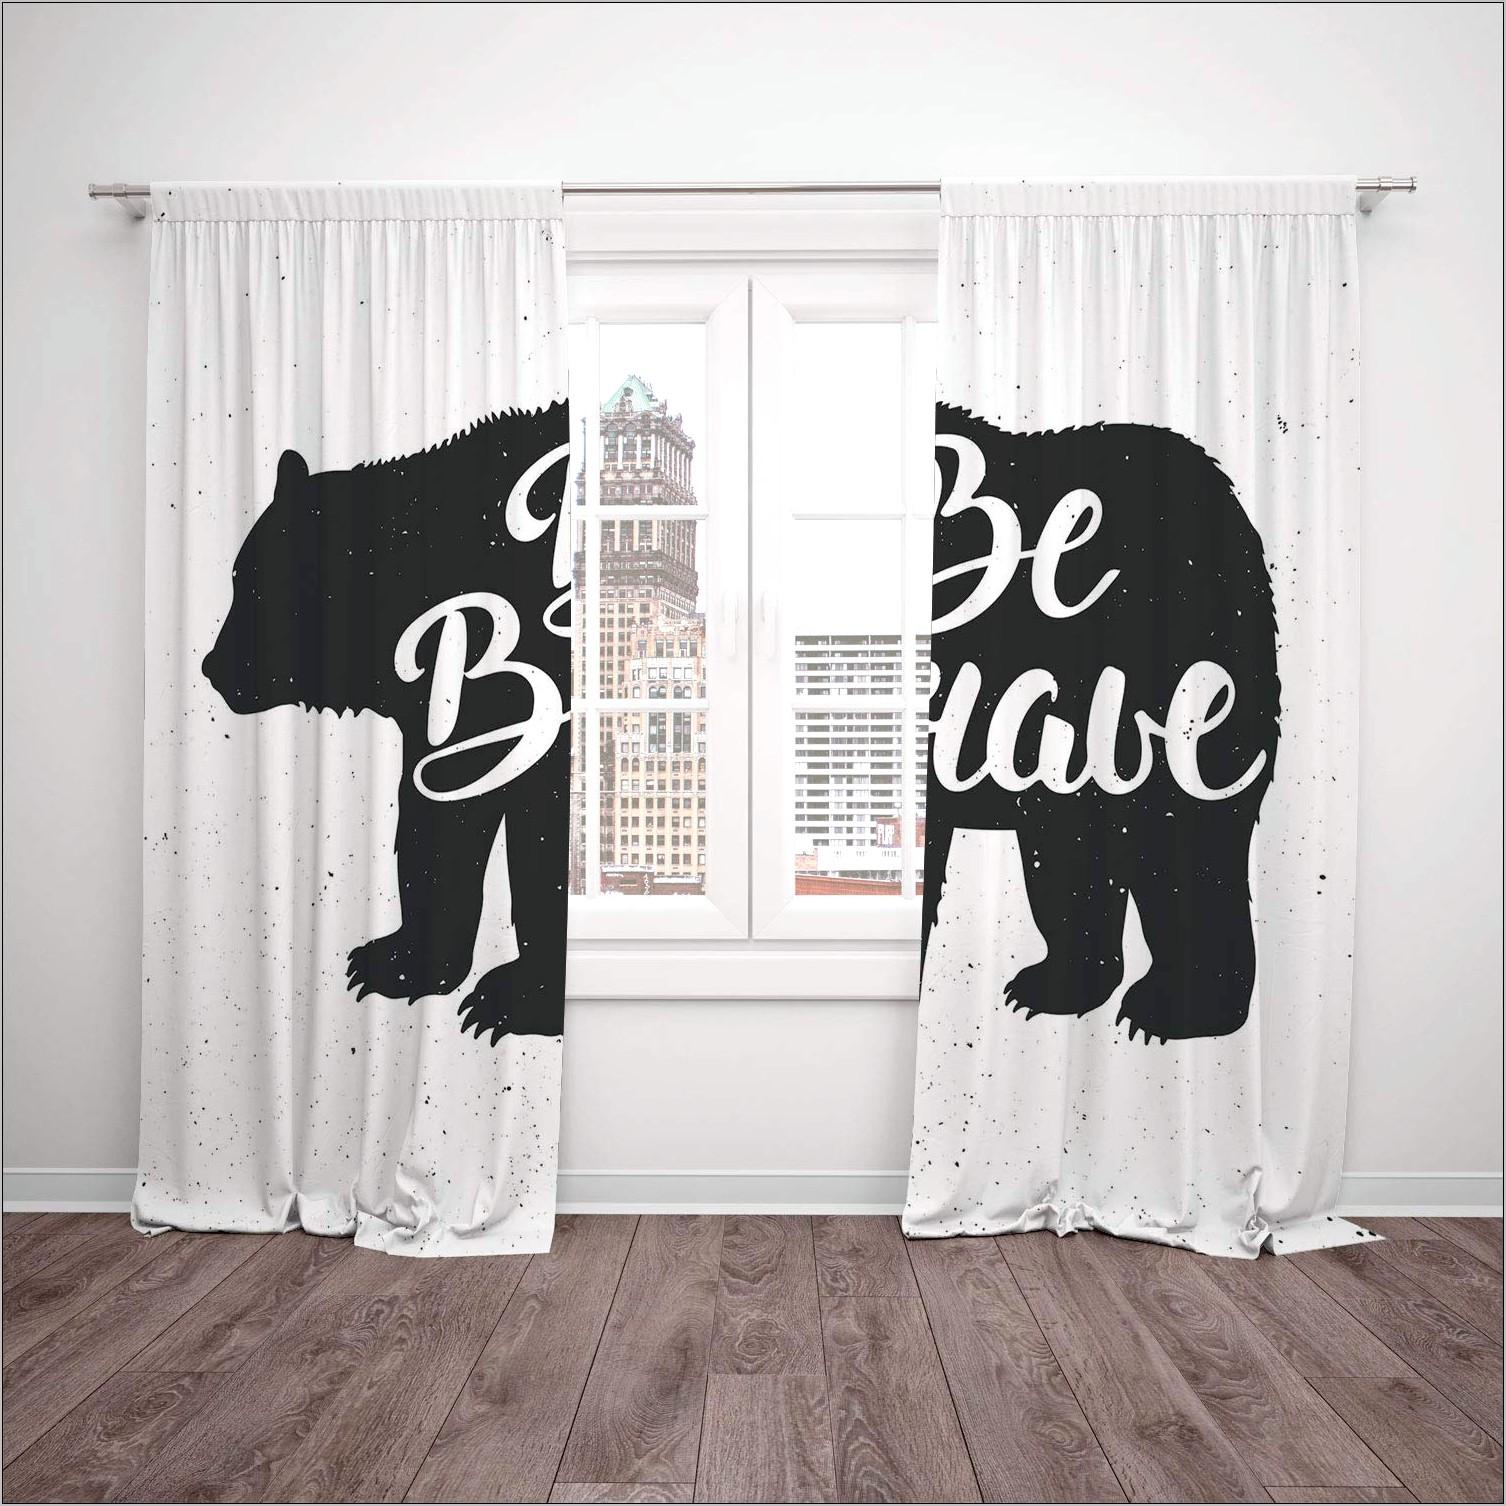 Cabin Decor Kitchen Curtains